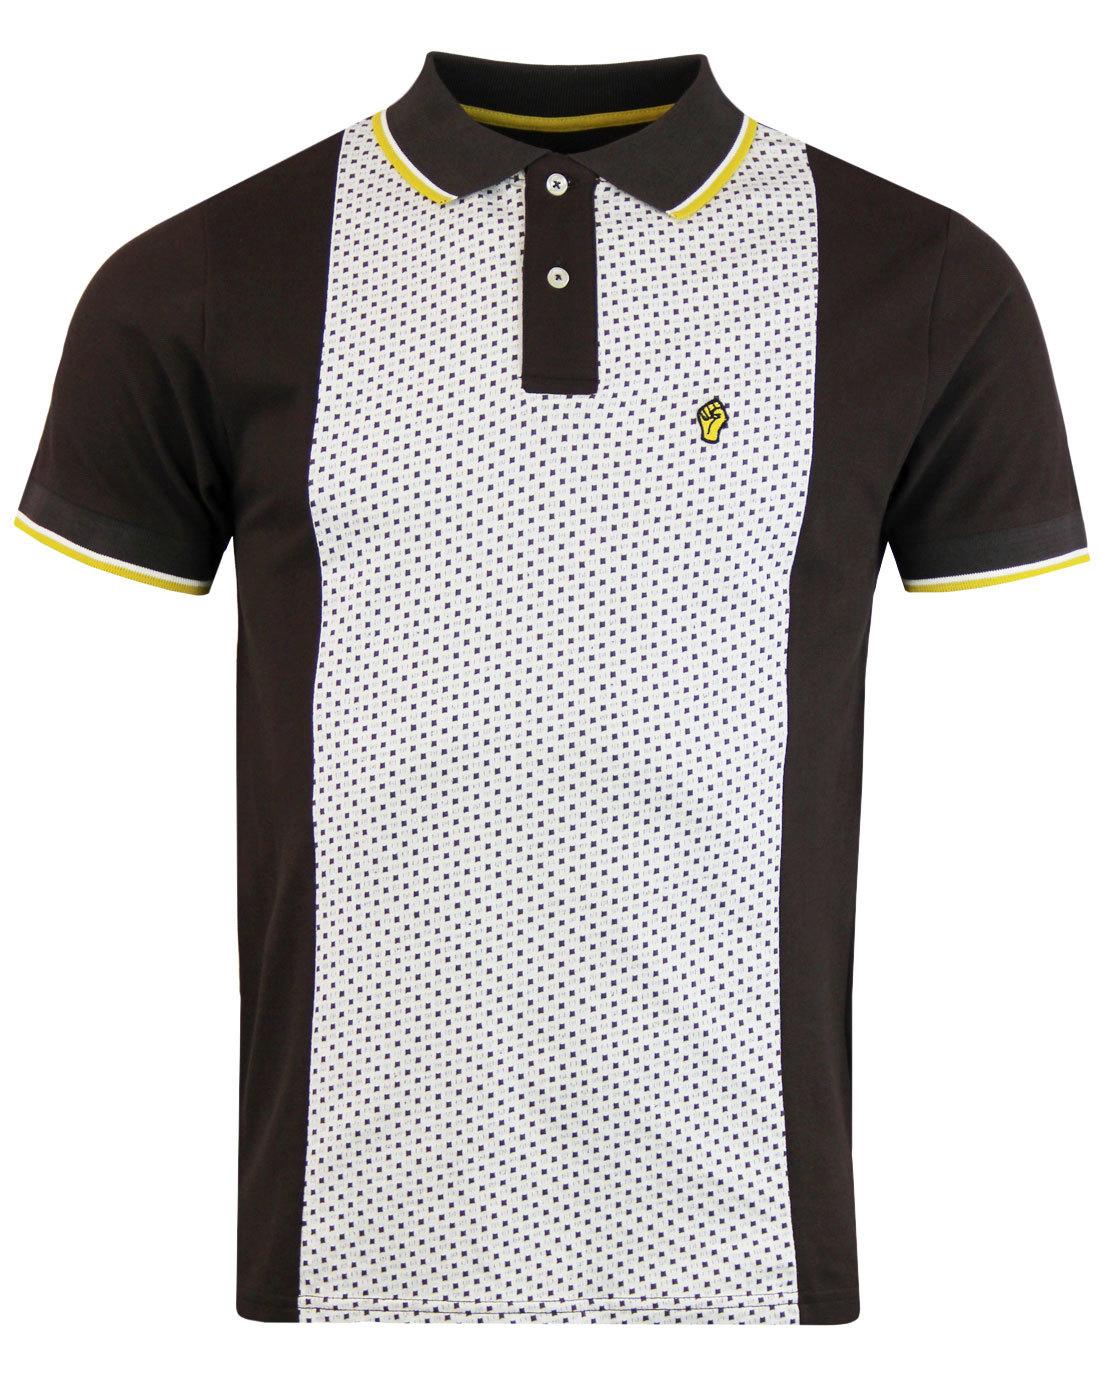 Northern Soul Polo T Shirts